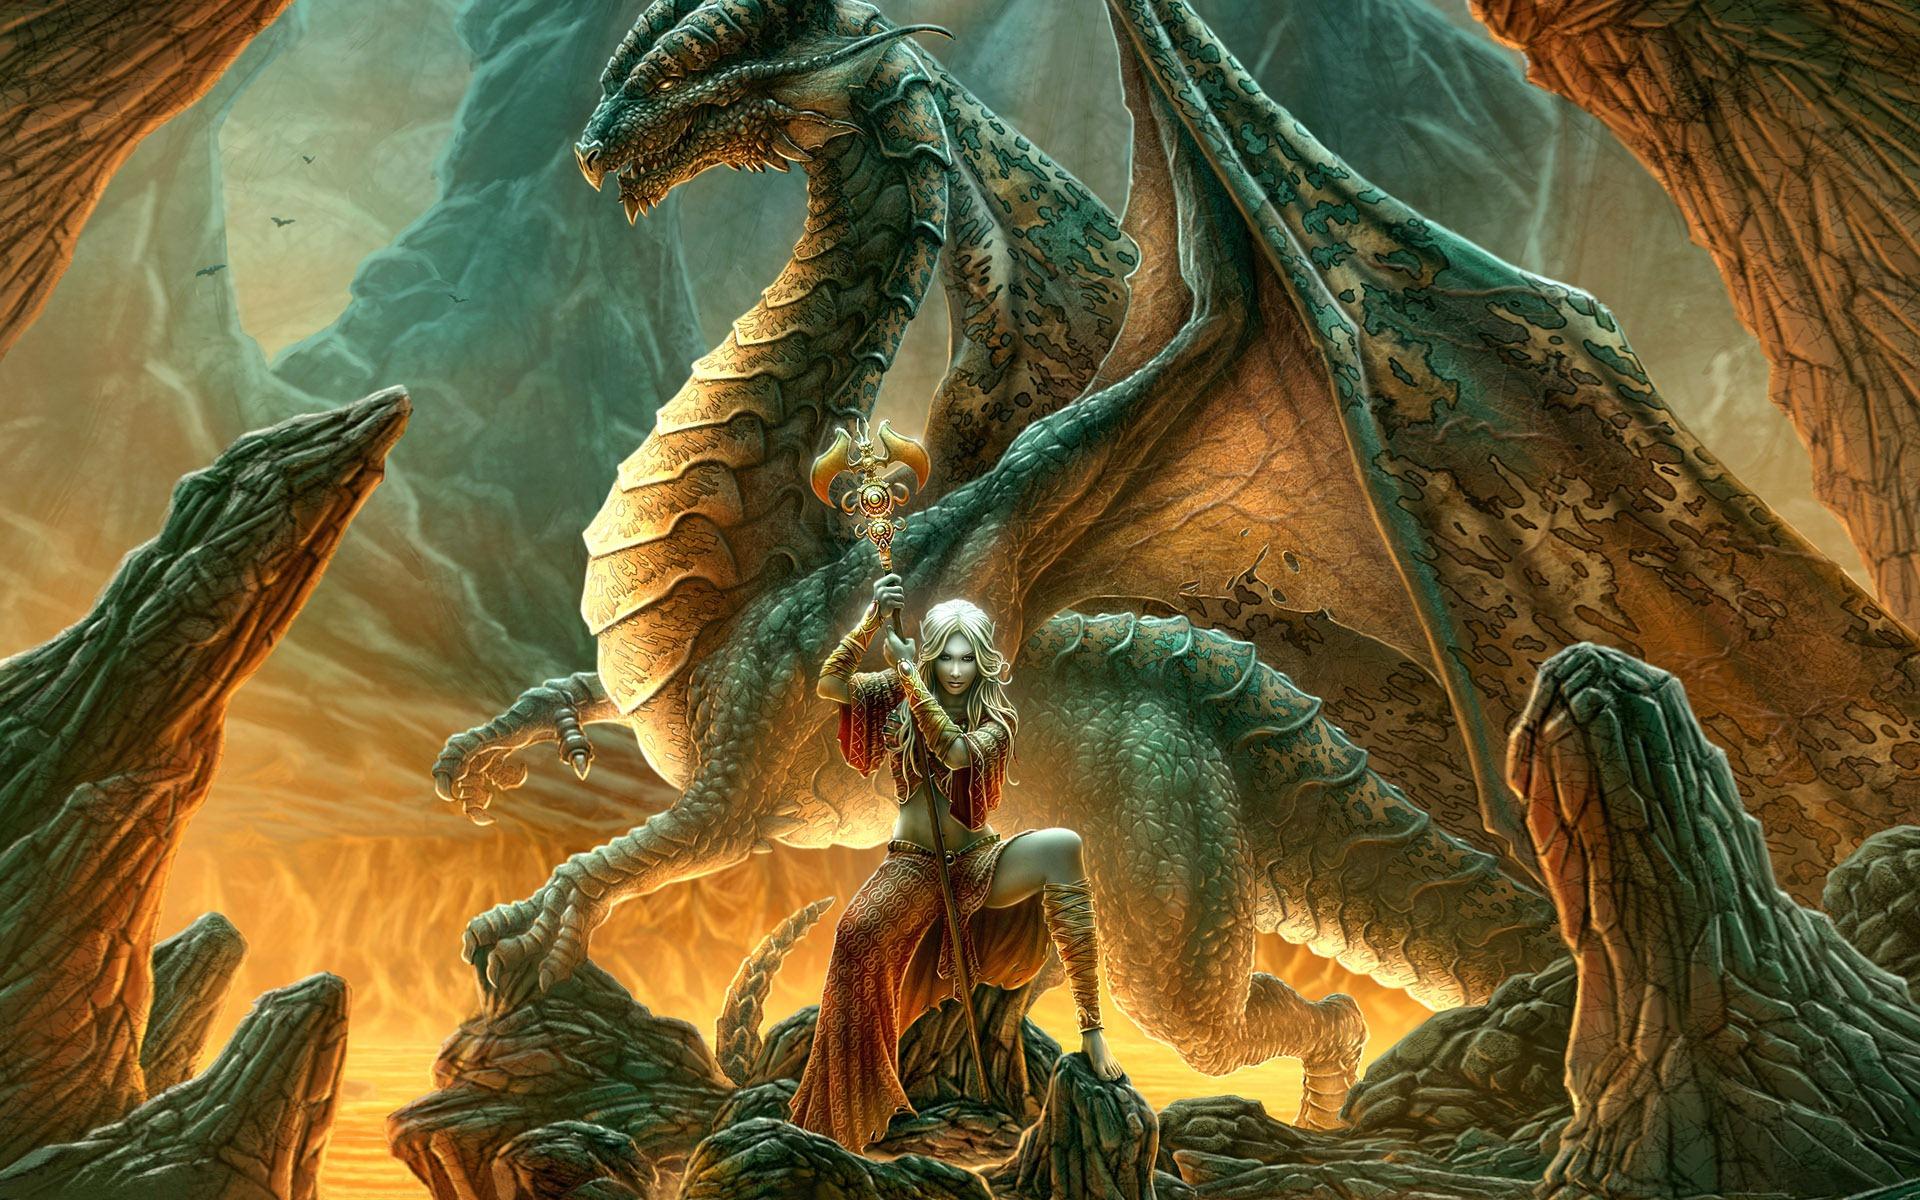 Dragon High Definition Wallpaper 1920x1200 1920x1200